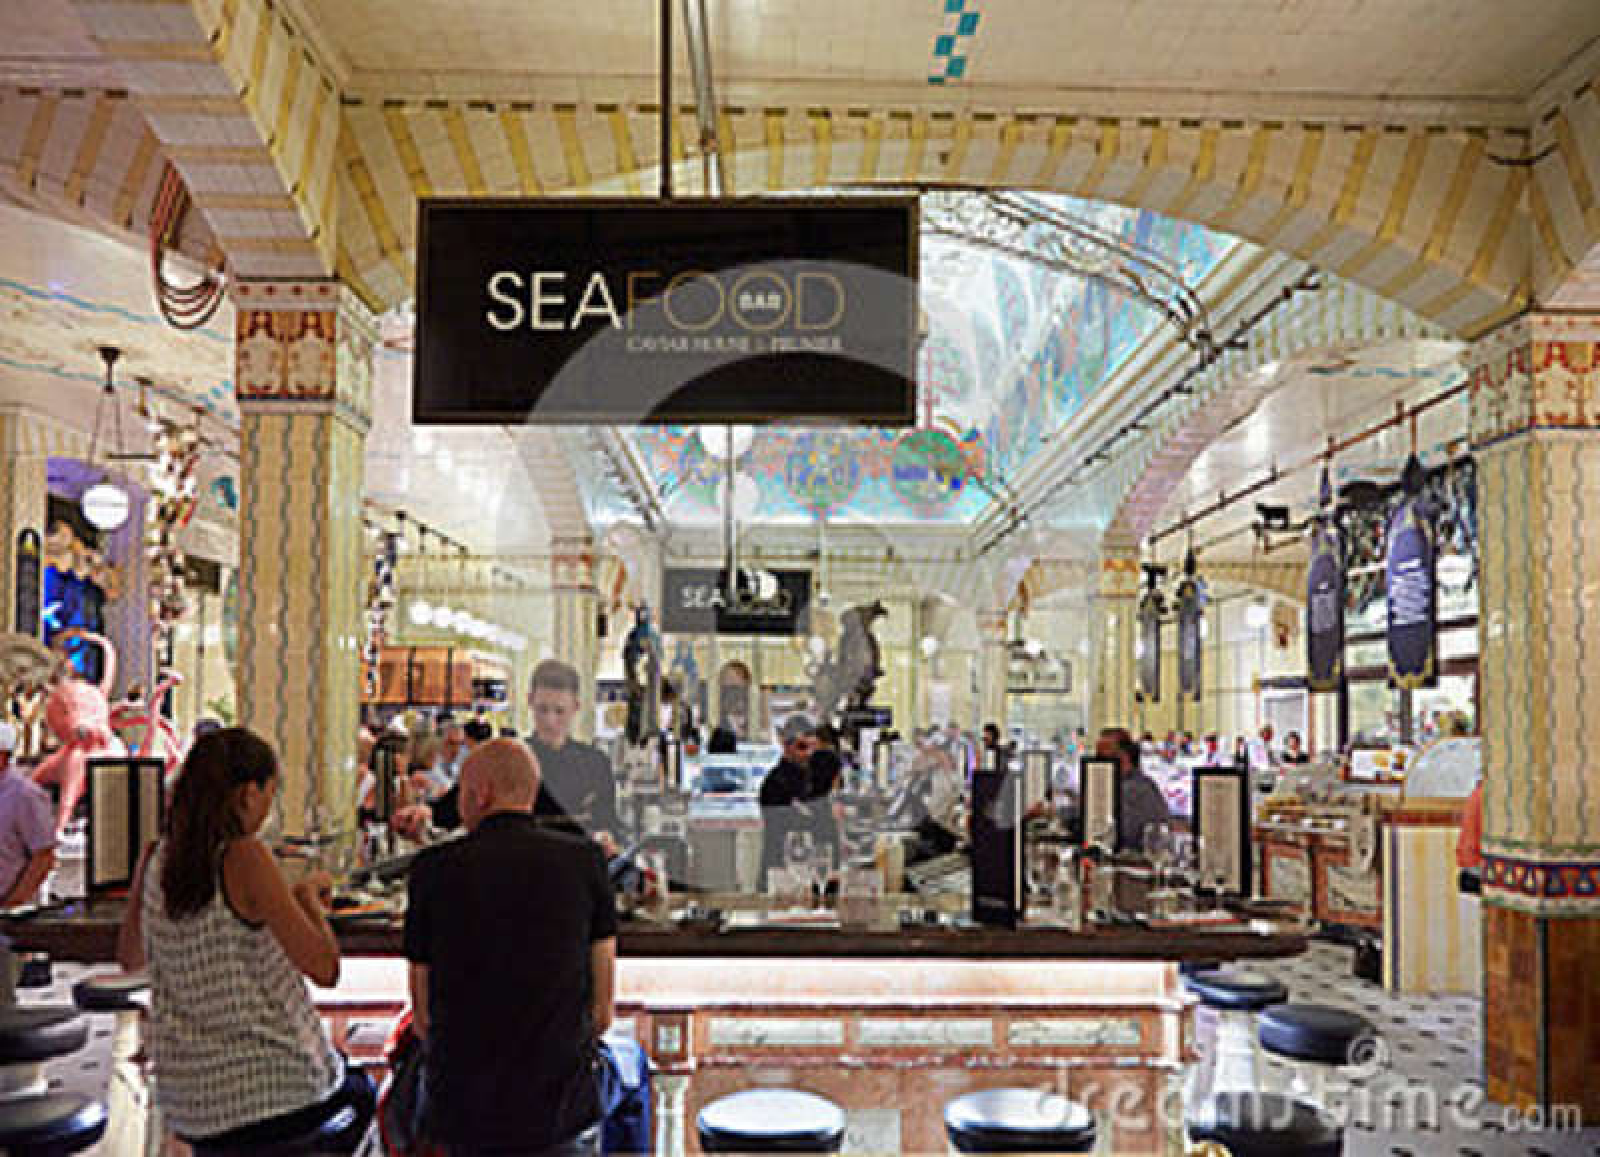 harrods department store interior sea food area